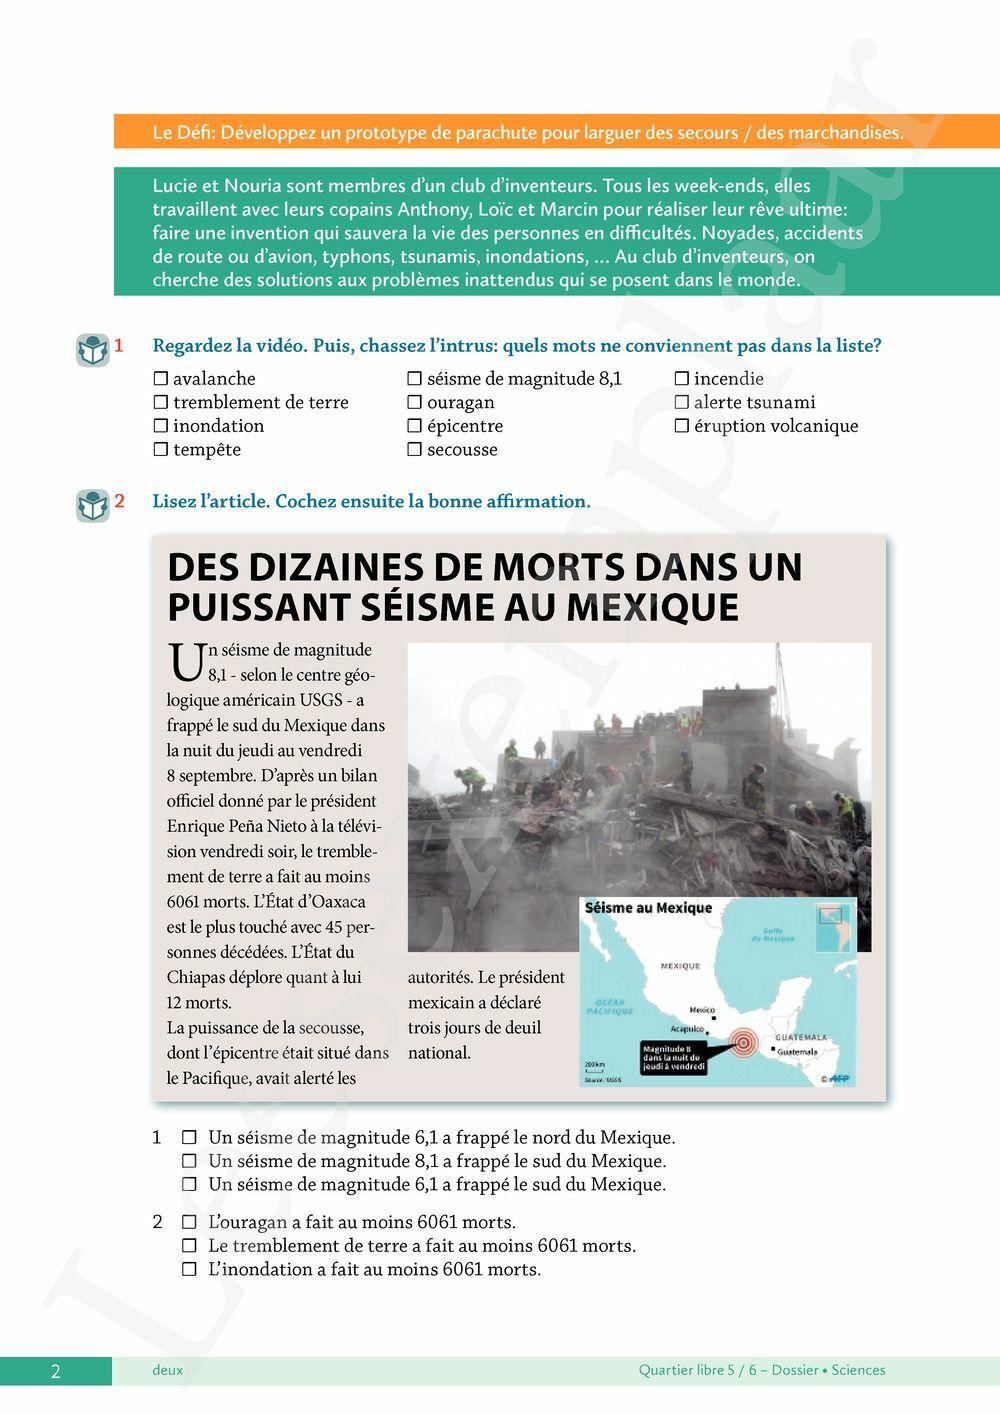 Preview: Quartier libre 5 / 6 Dossier Sciences